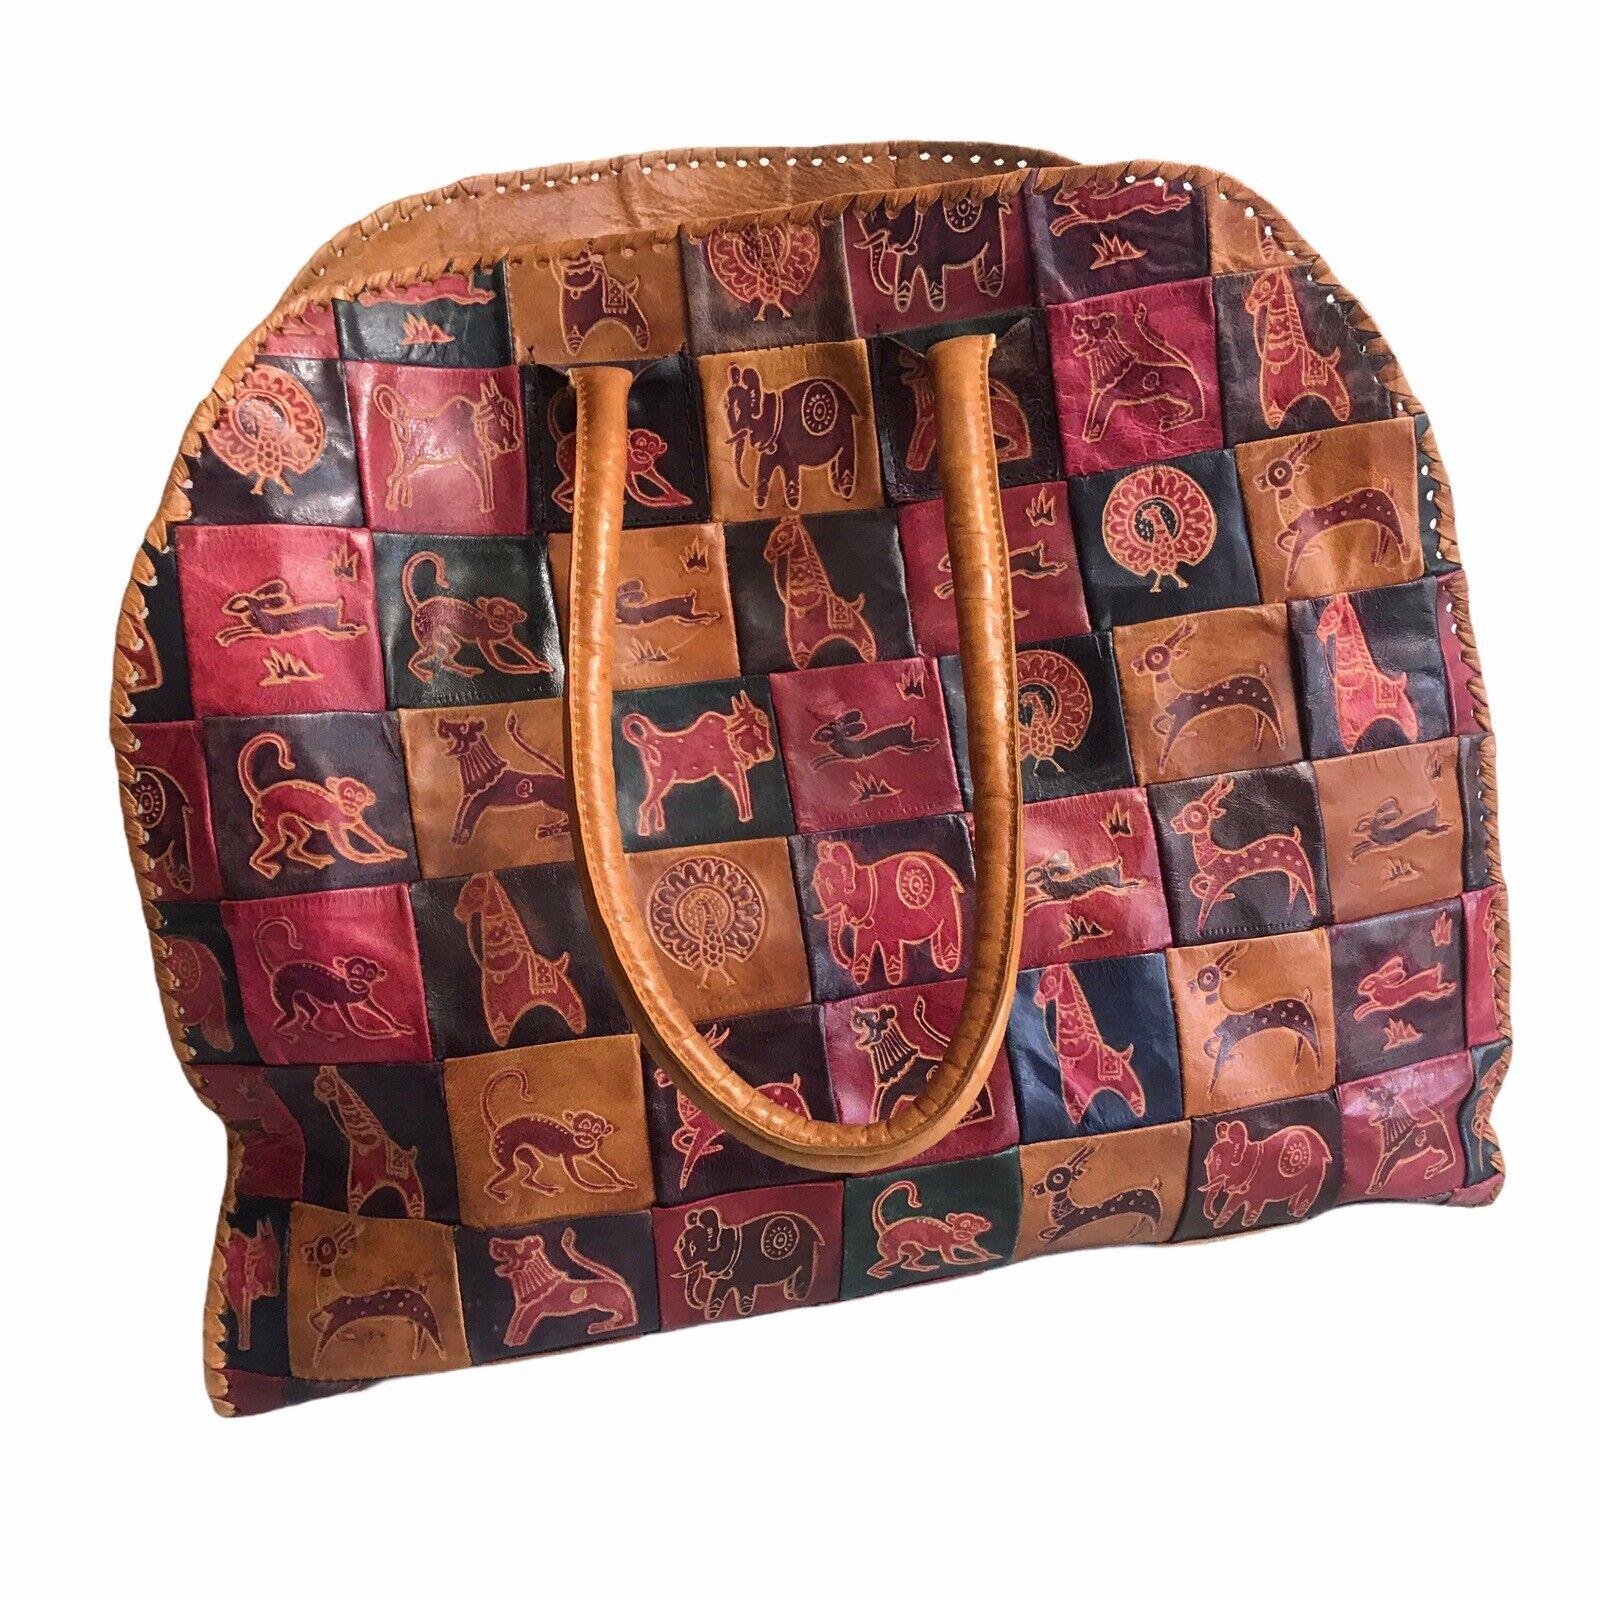 Vtg Leather Patchwork Tote Bag Purse Embossed Animals Jungle Safari